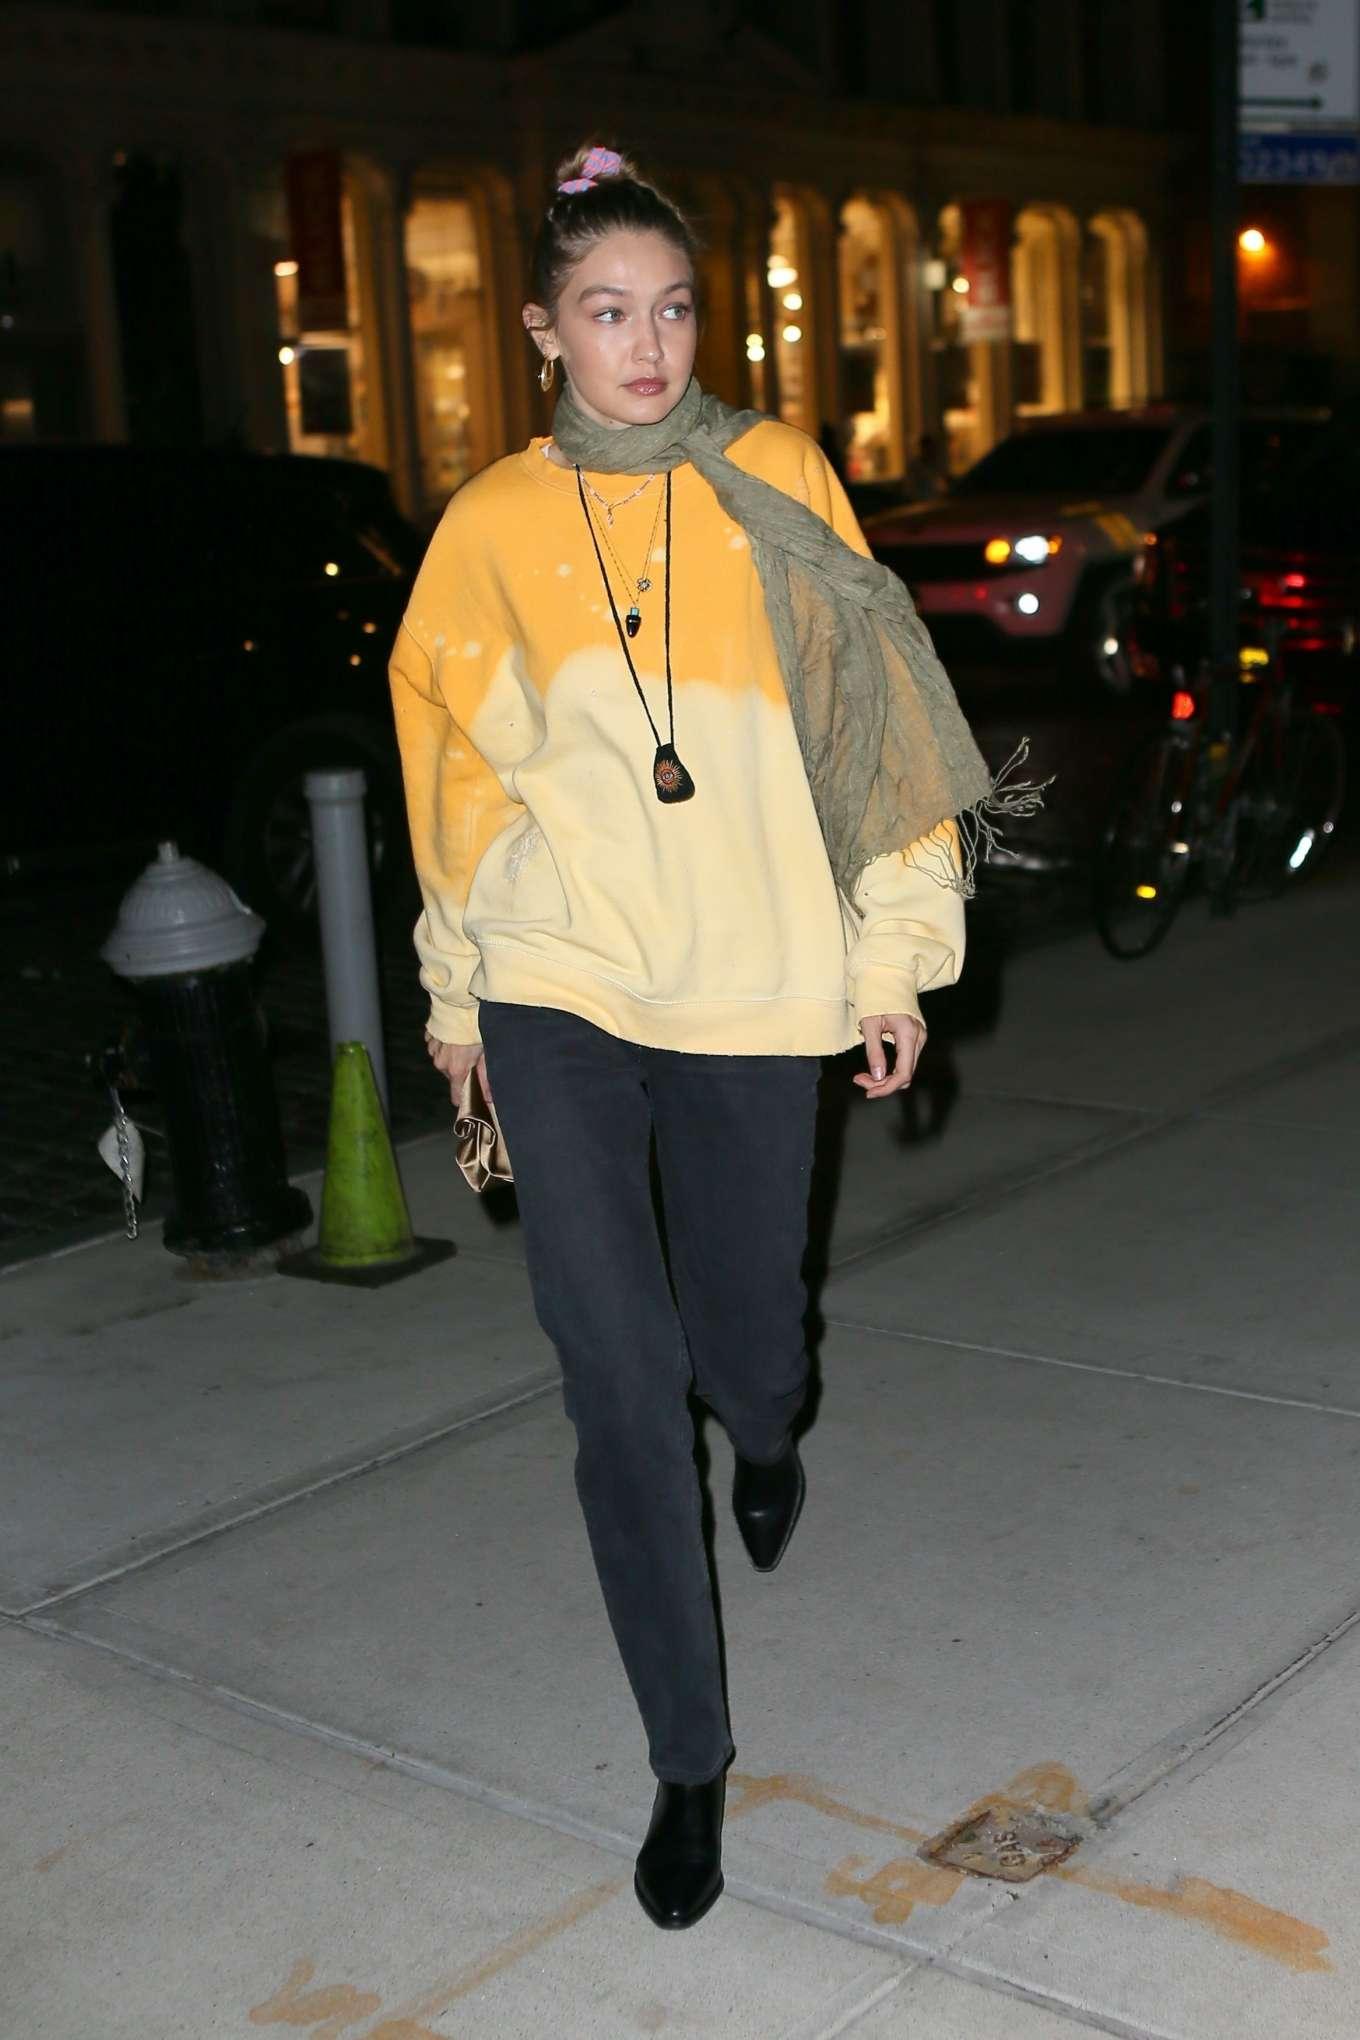 Gigi Hadid 2019 : Gigi Hadid – Leaving La Esquina Restaurant-23